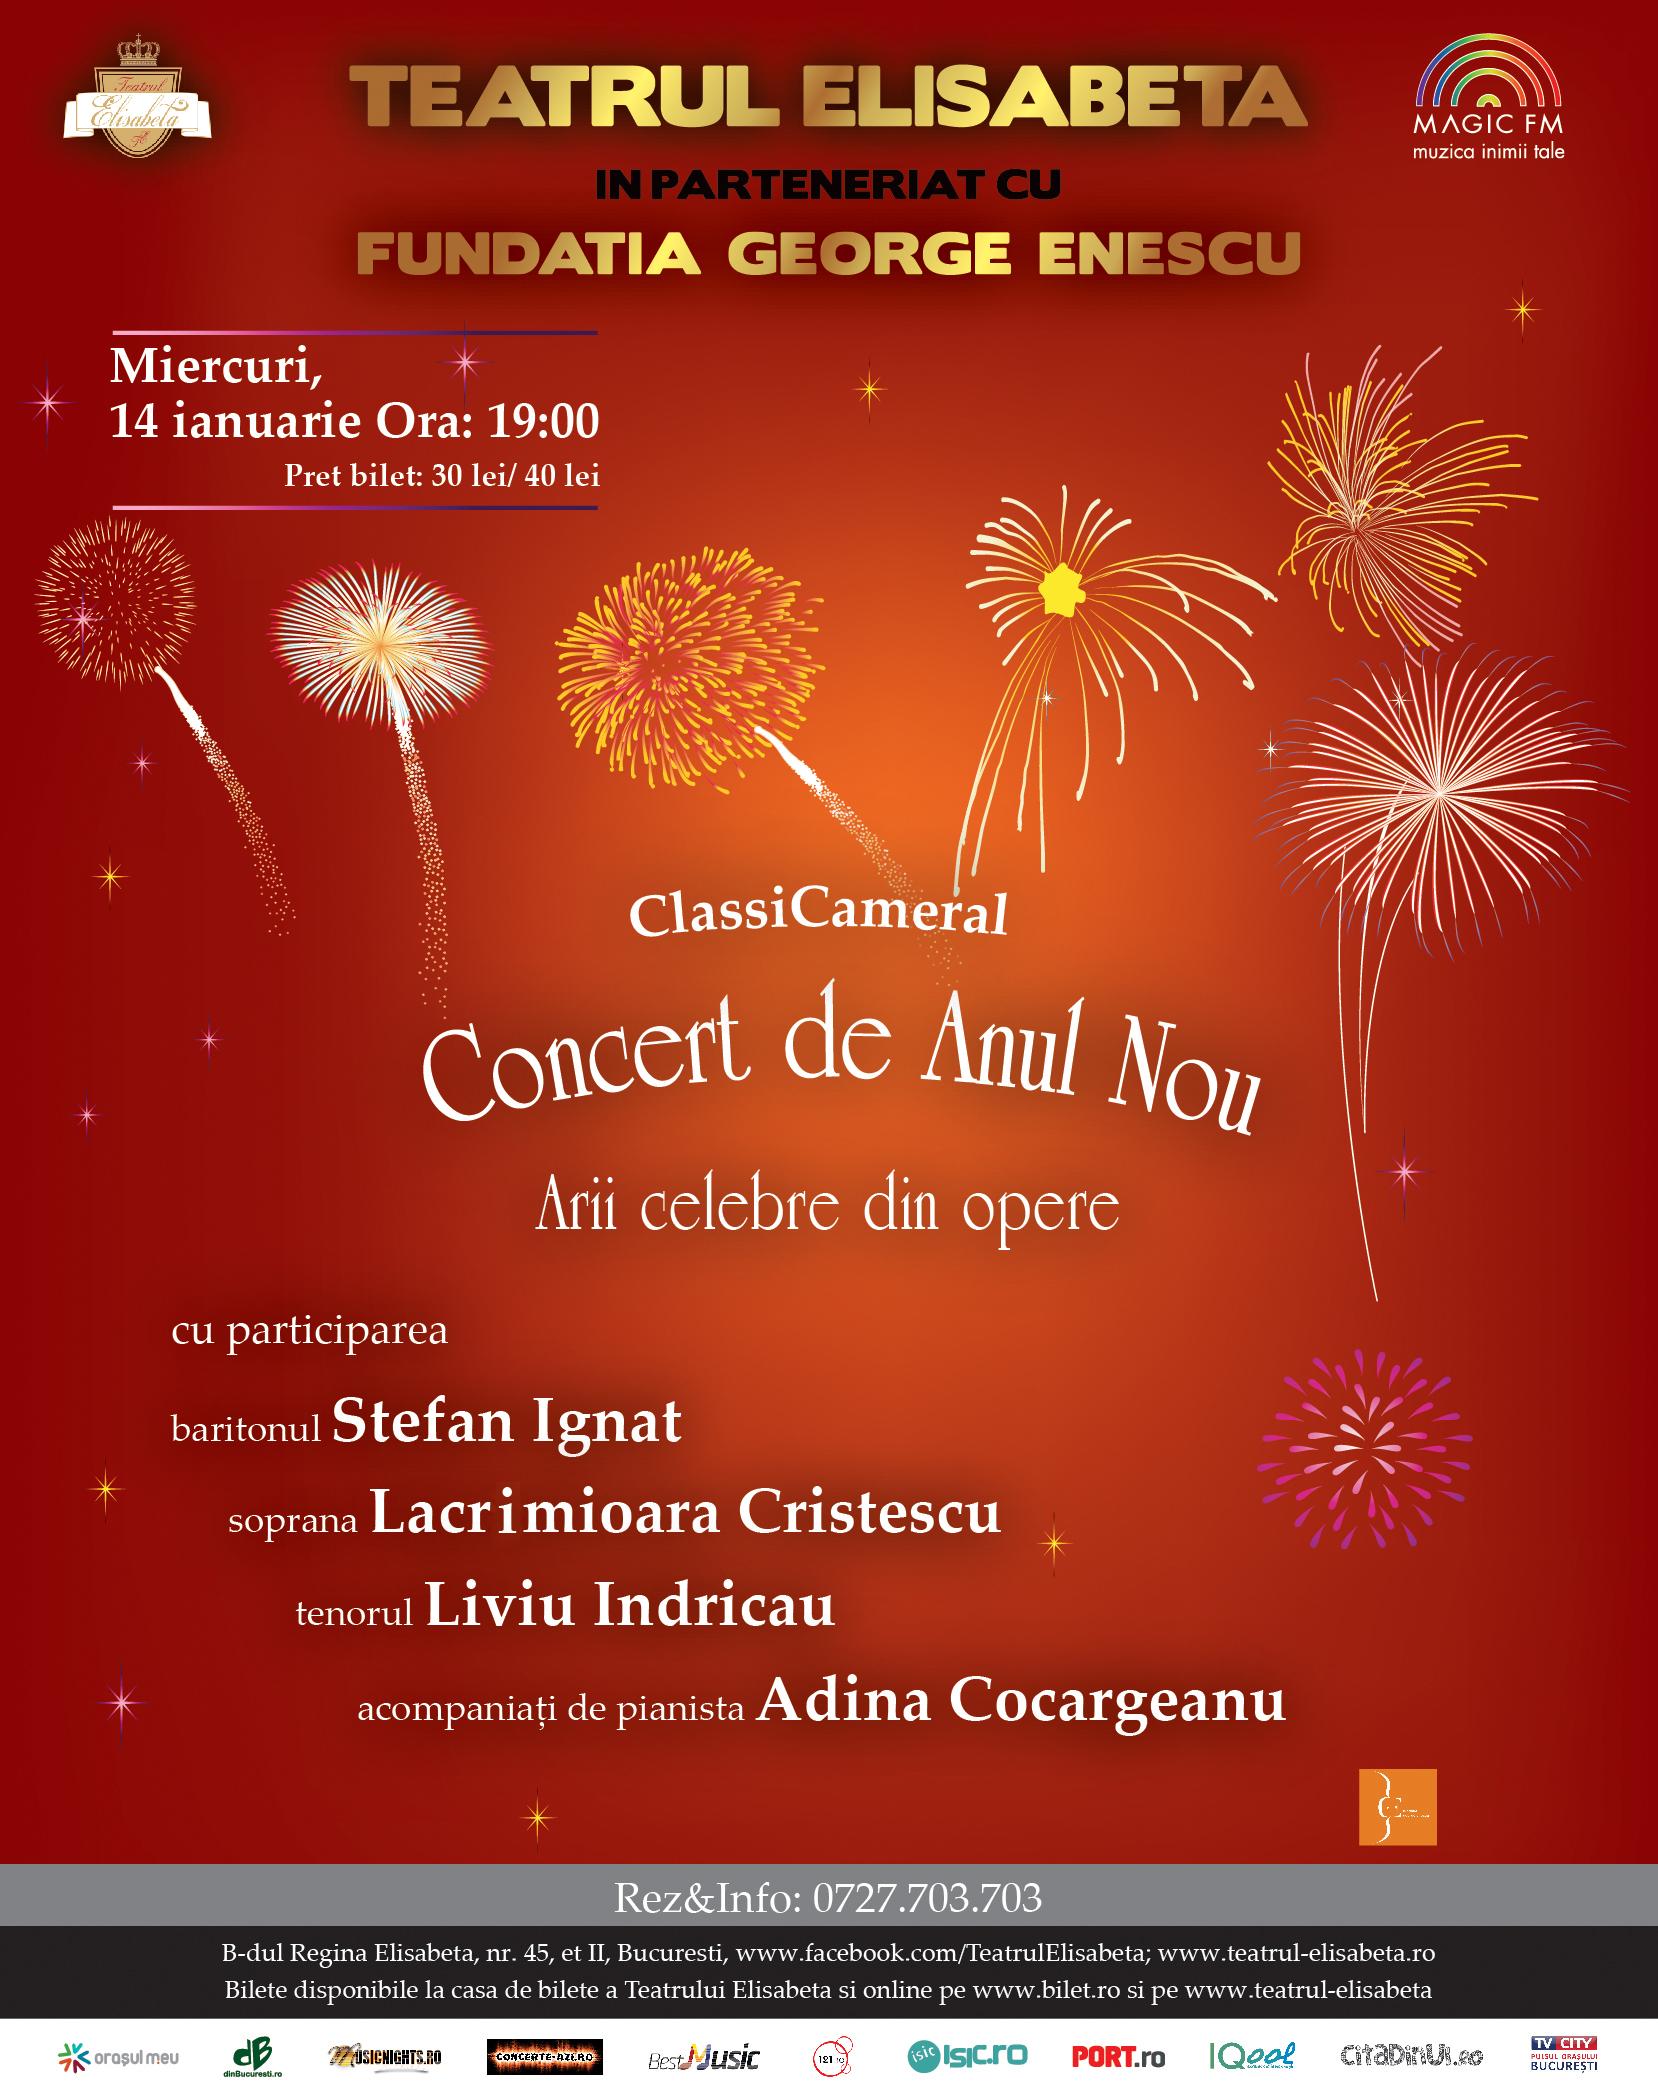 Afis 50x70 cm ClassiCameral Concert de Anul Nou